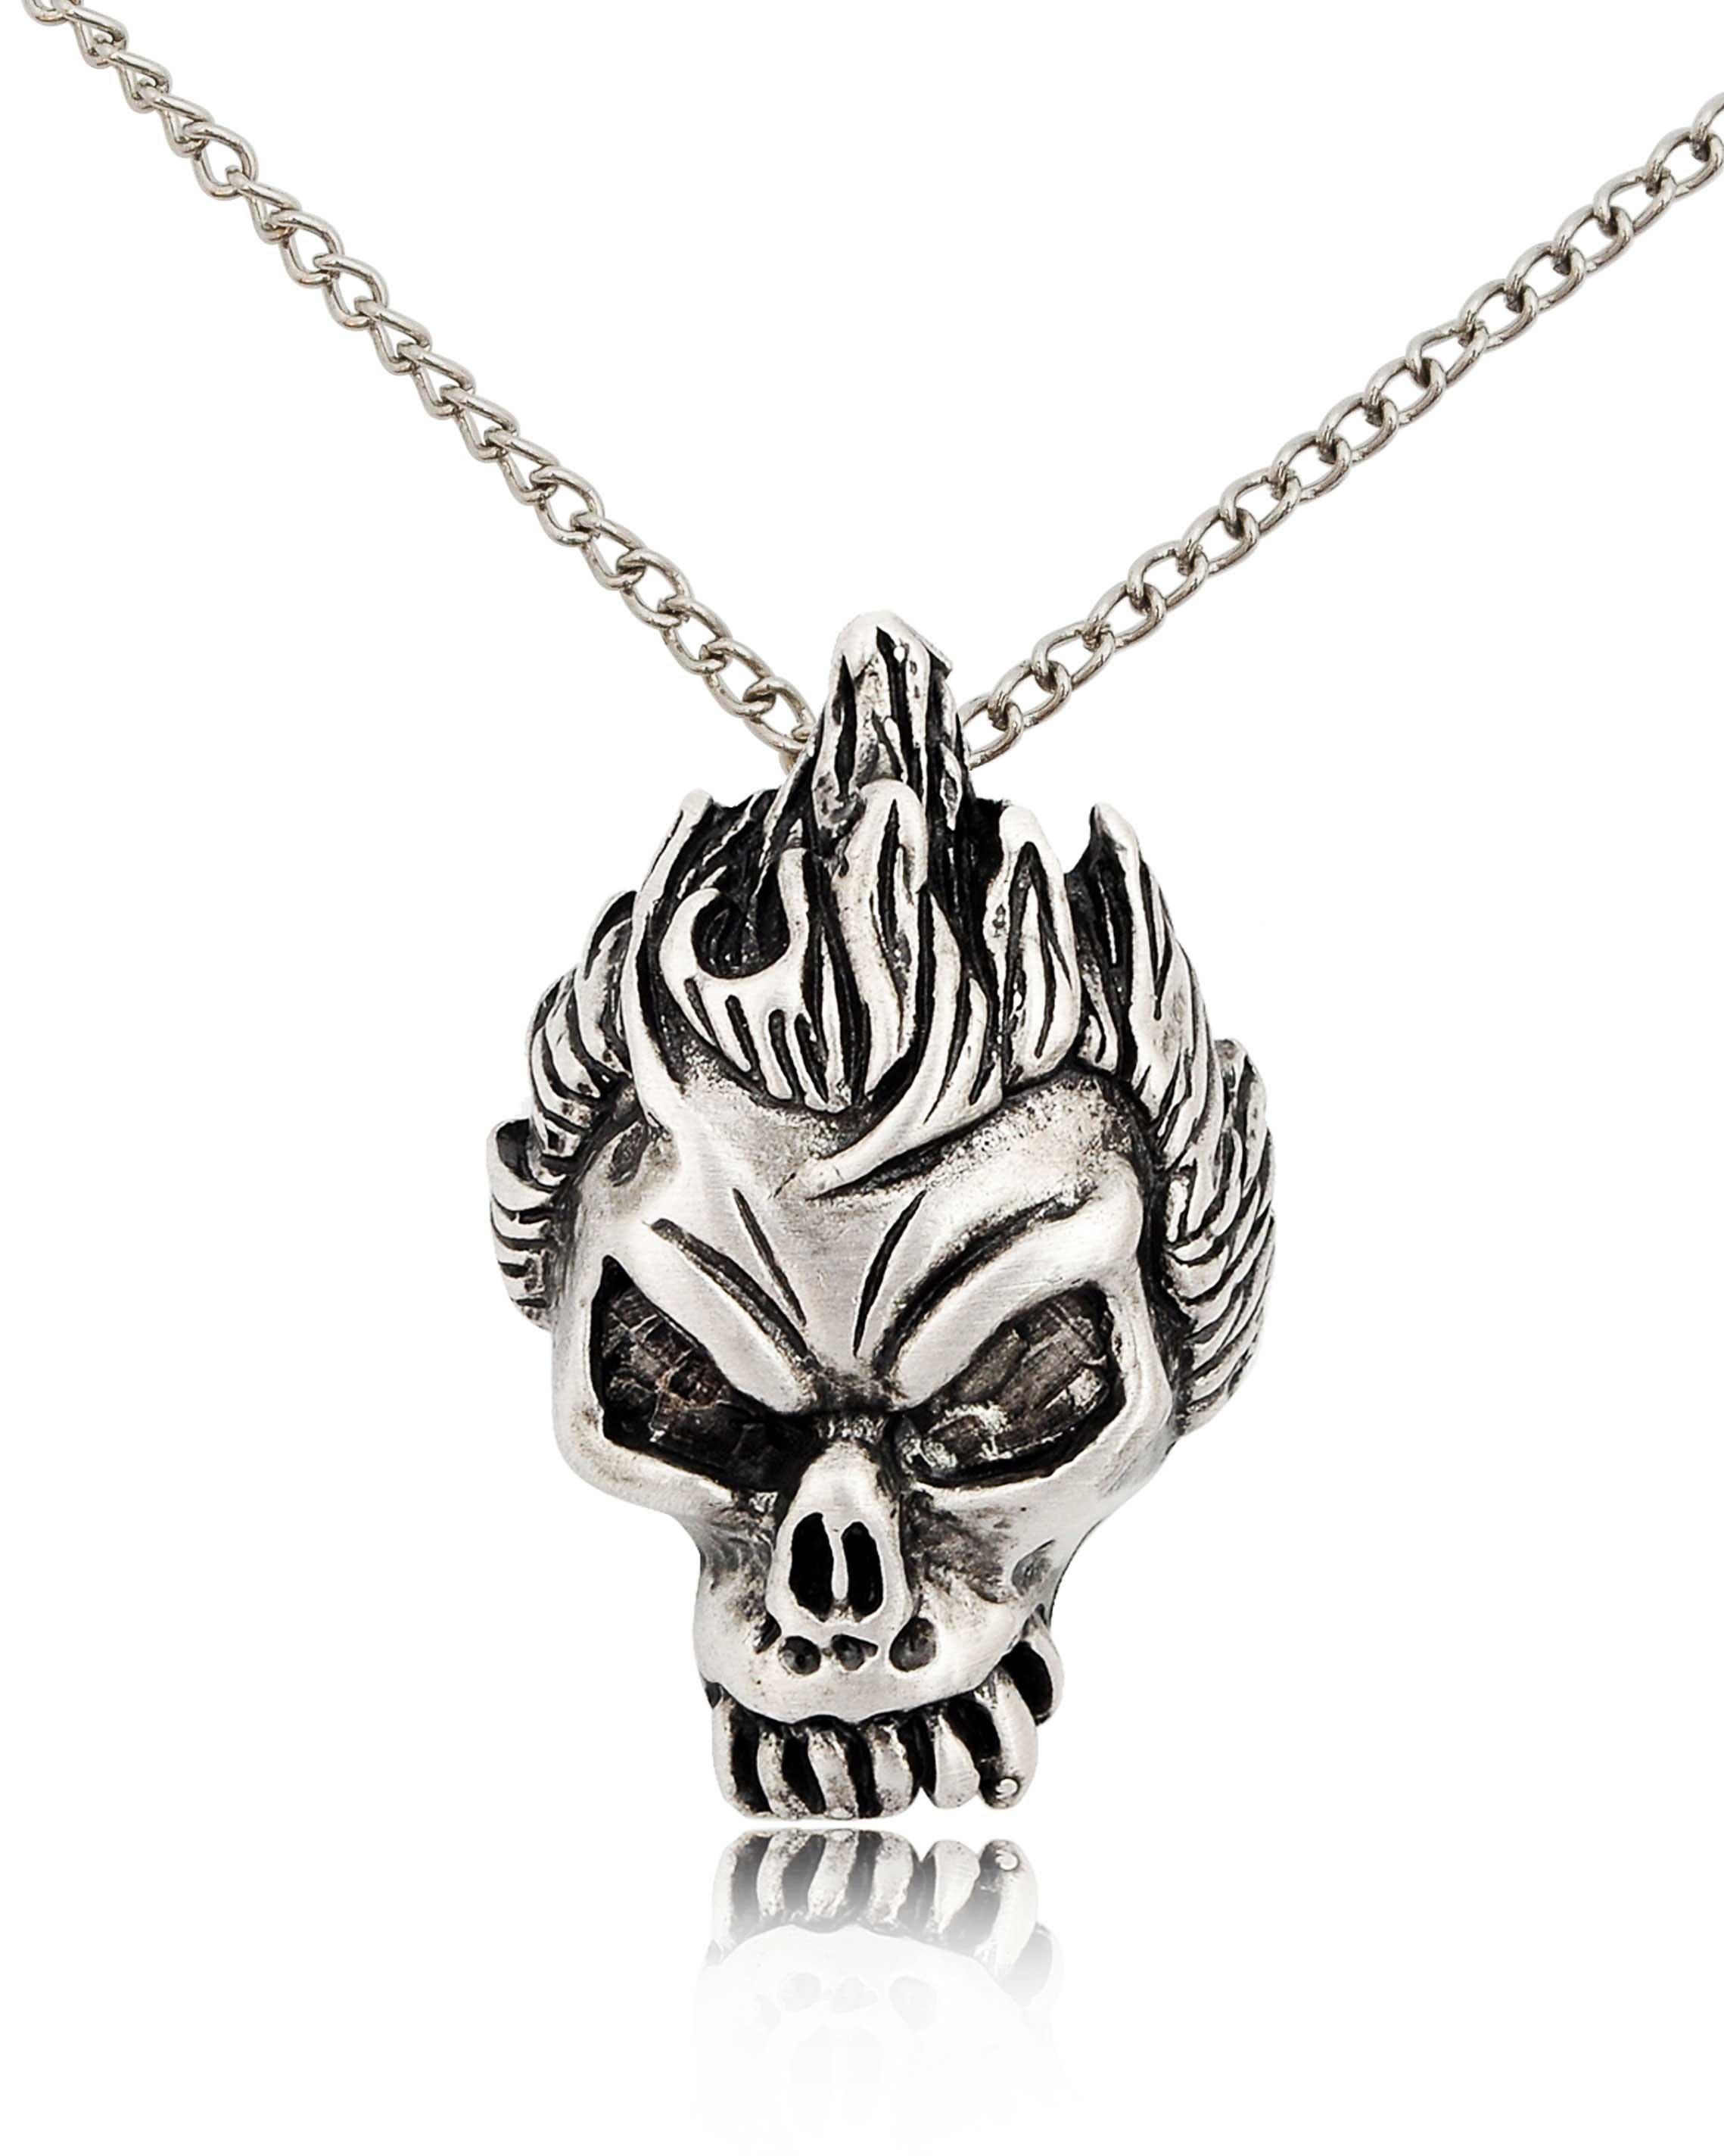 Handmade Gothic Harajuku Fashion W H Naoto Spiderweb Bag: Gothic Skull Handmade Brass Charm Necklace Pendant Jewelry